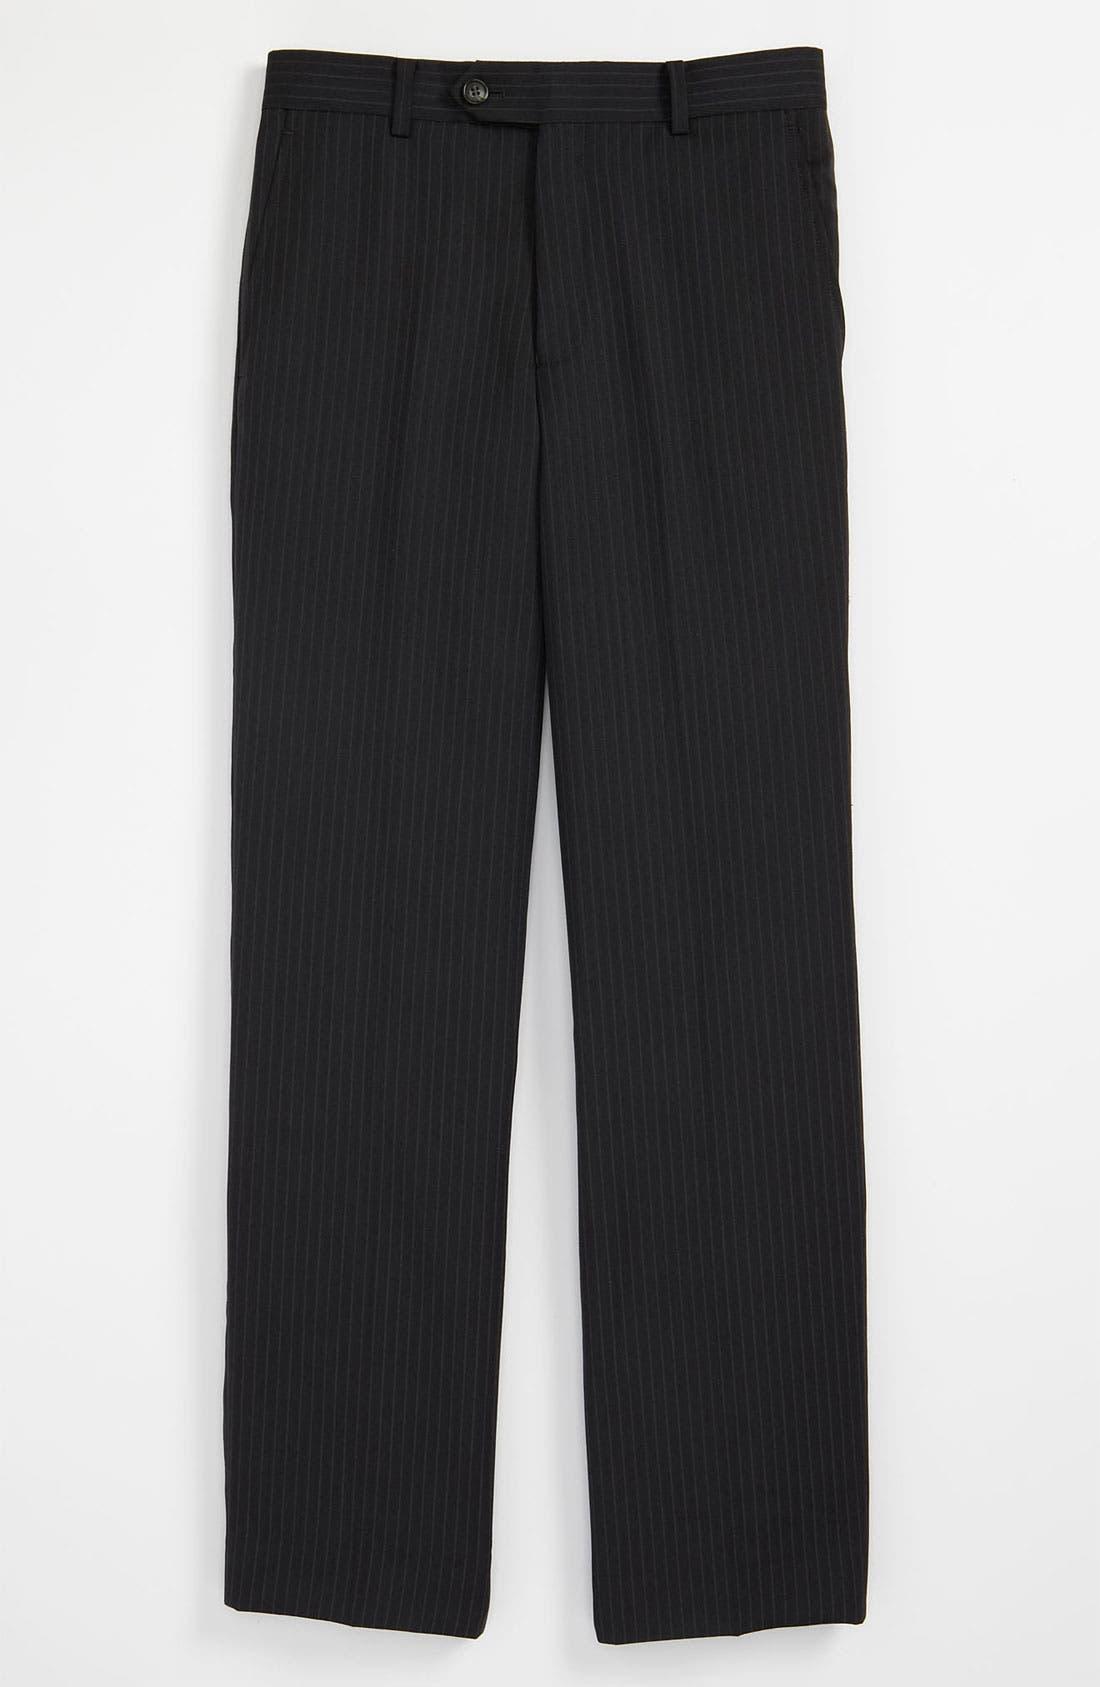 Alternate Image 1 Selected - Joseph Abboud Stripe Grey Flat Front Dress Pants (Big Boys)